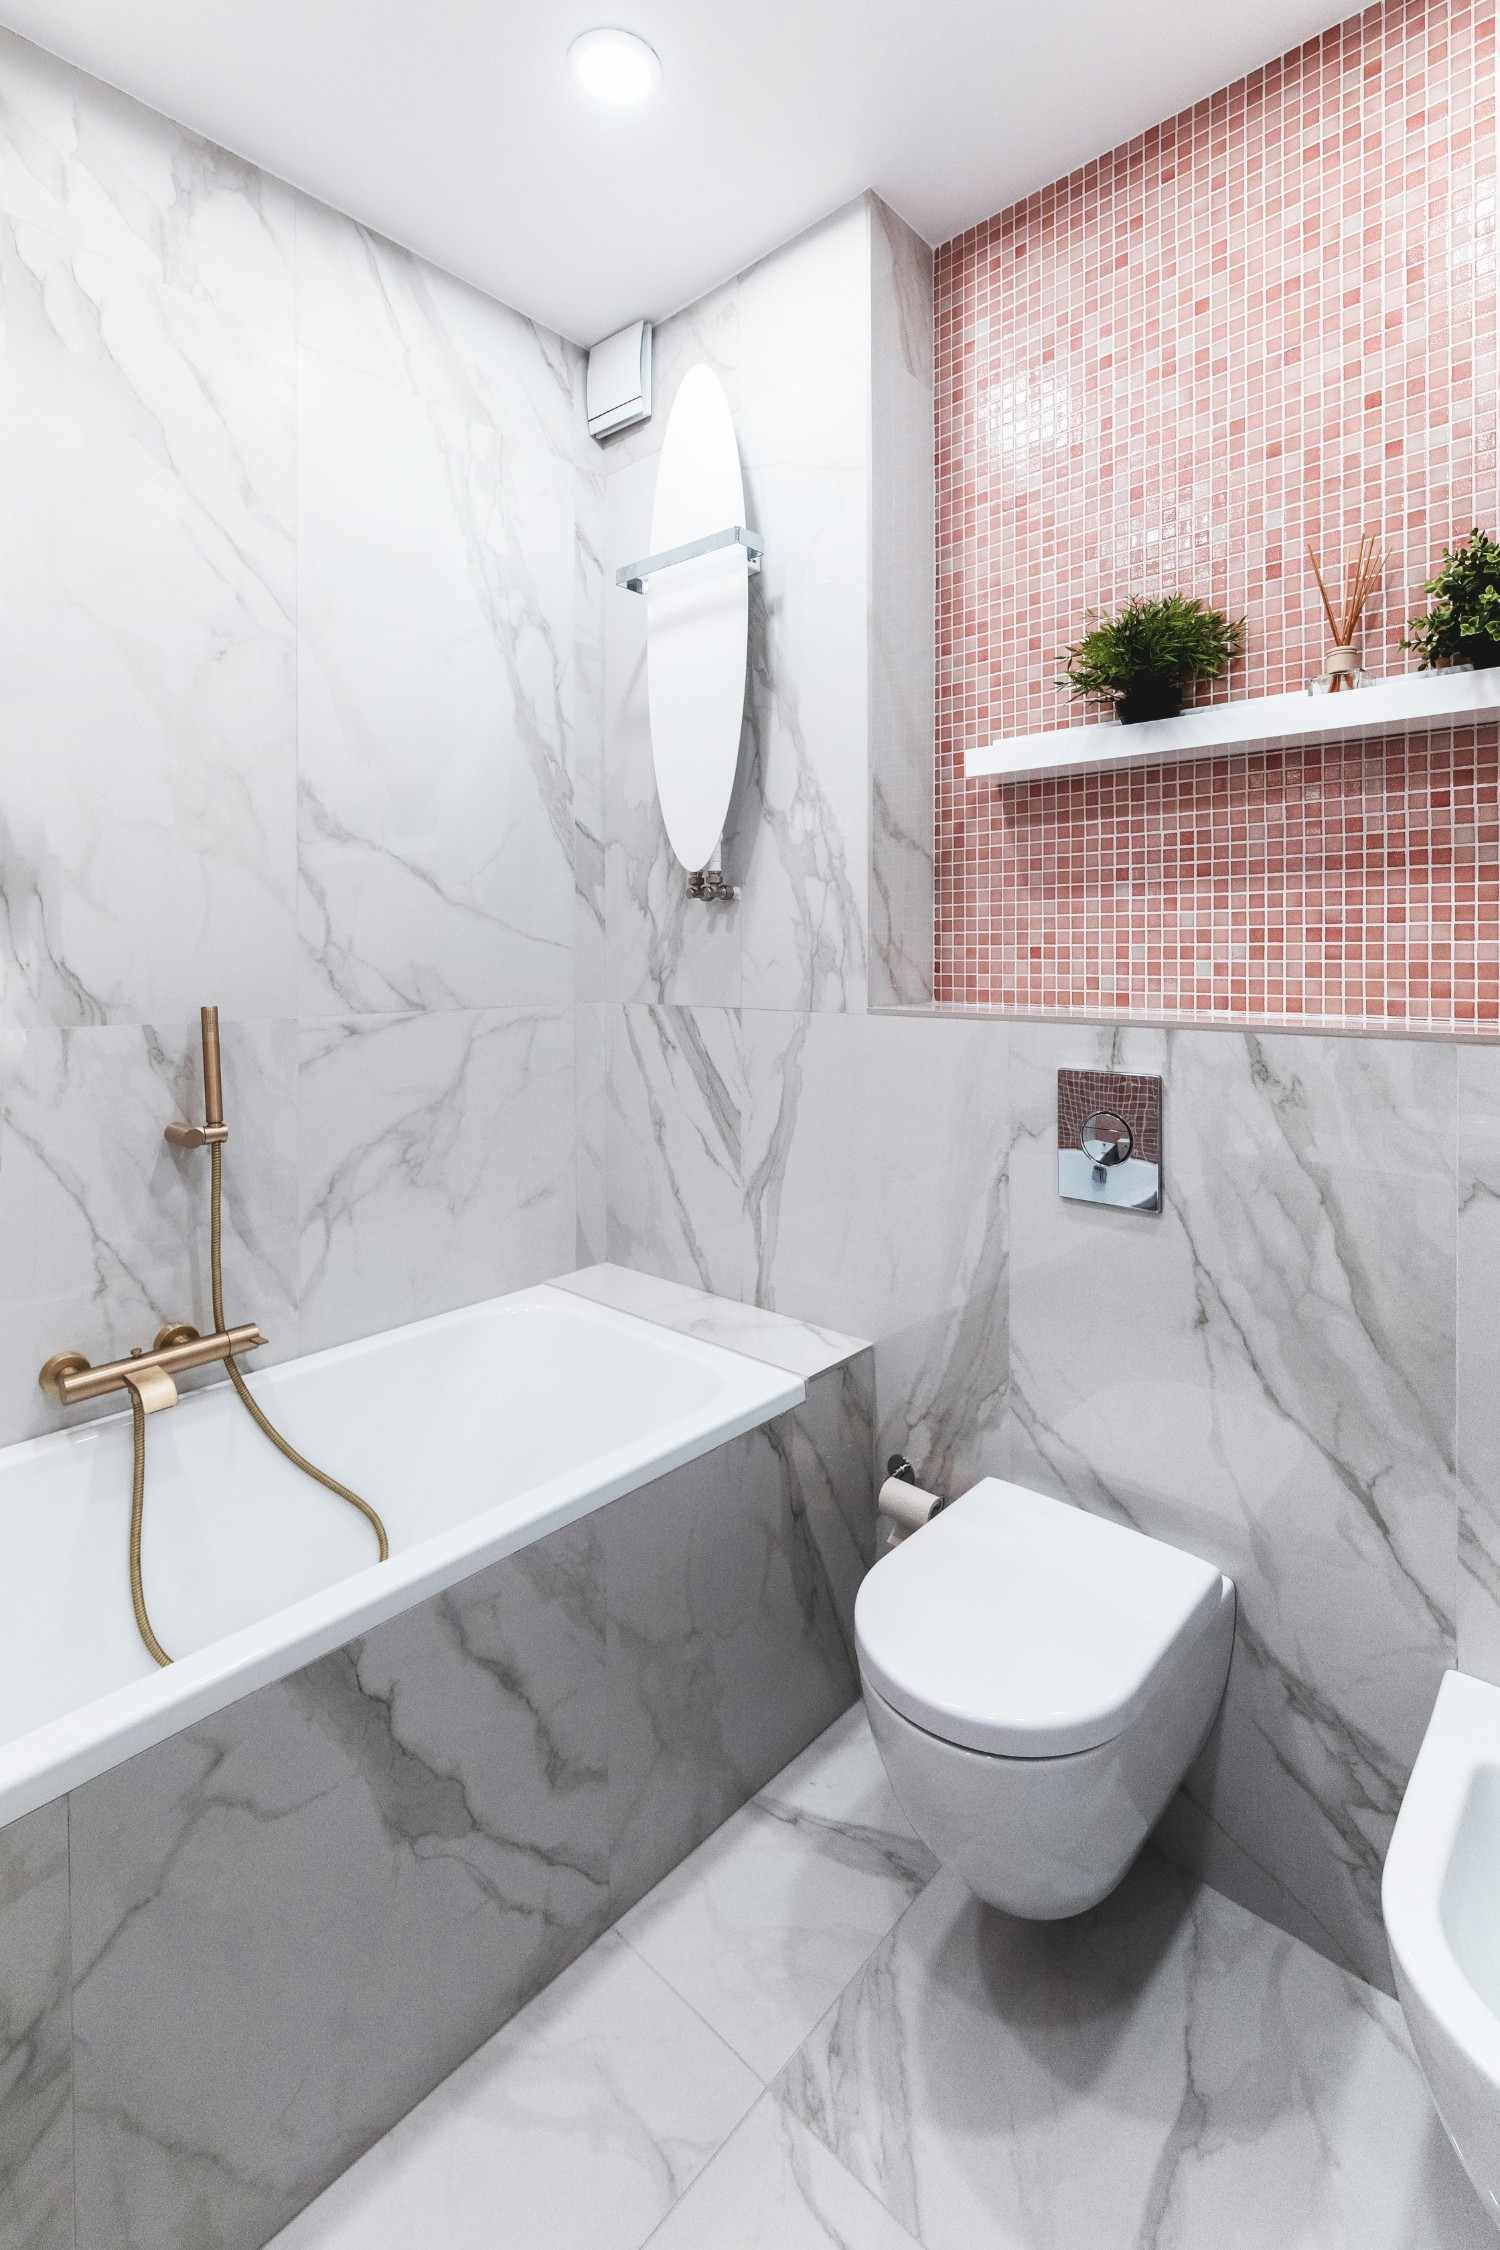 Amenajare baie roz_mozaic_semn hello_baie fetita_Studio 2.1